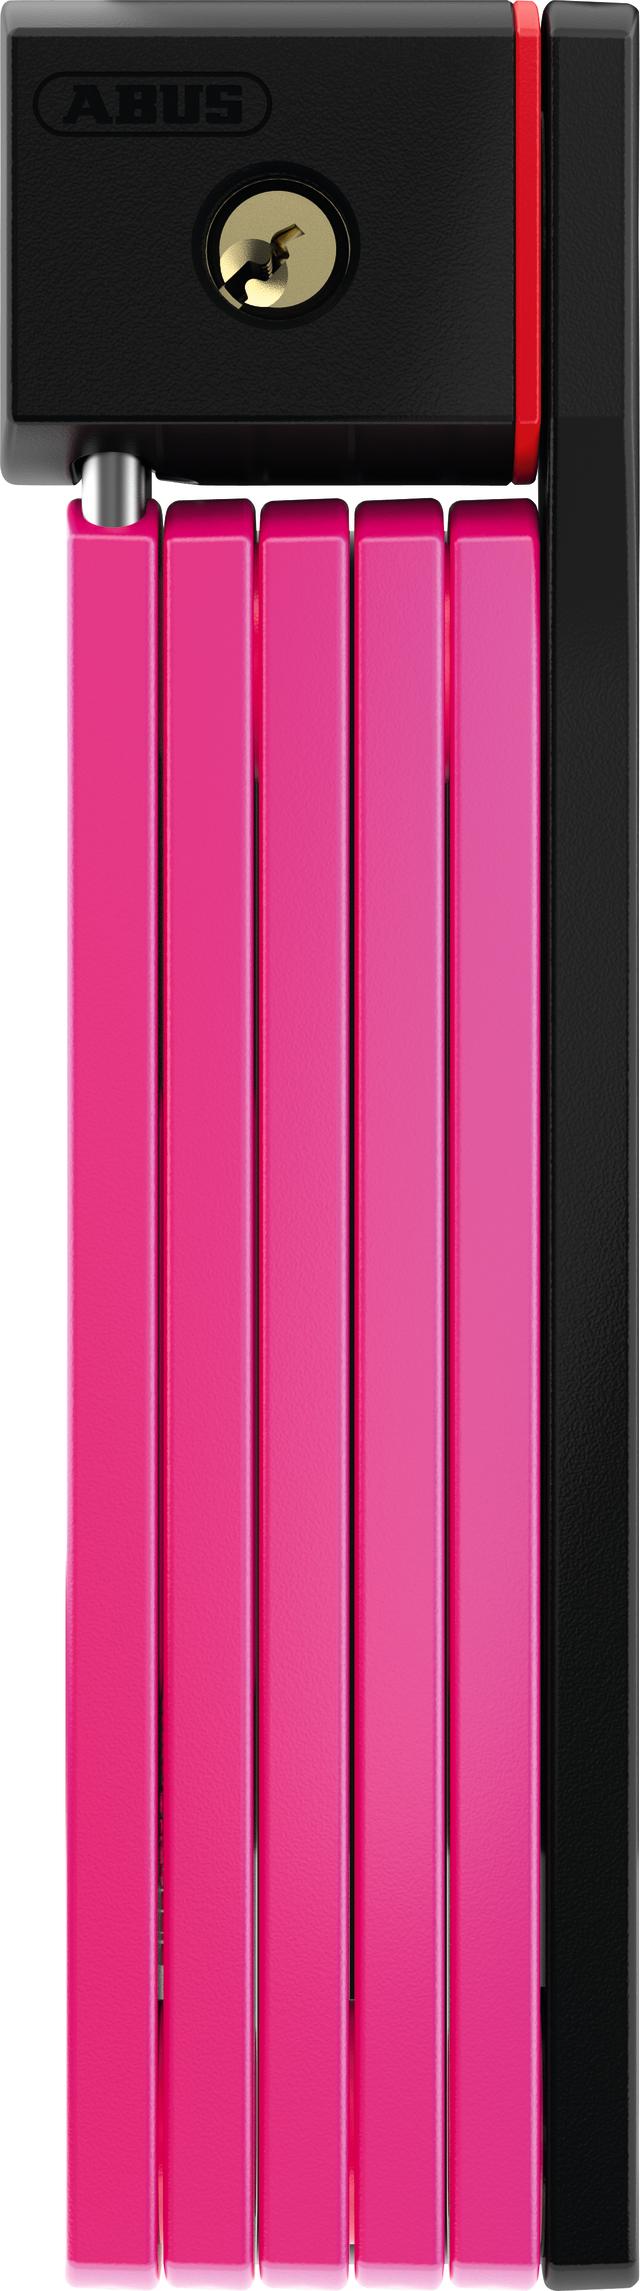 Antifurto pieghevole 5700/80 rosa